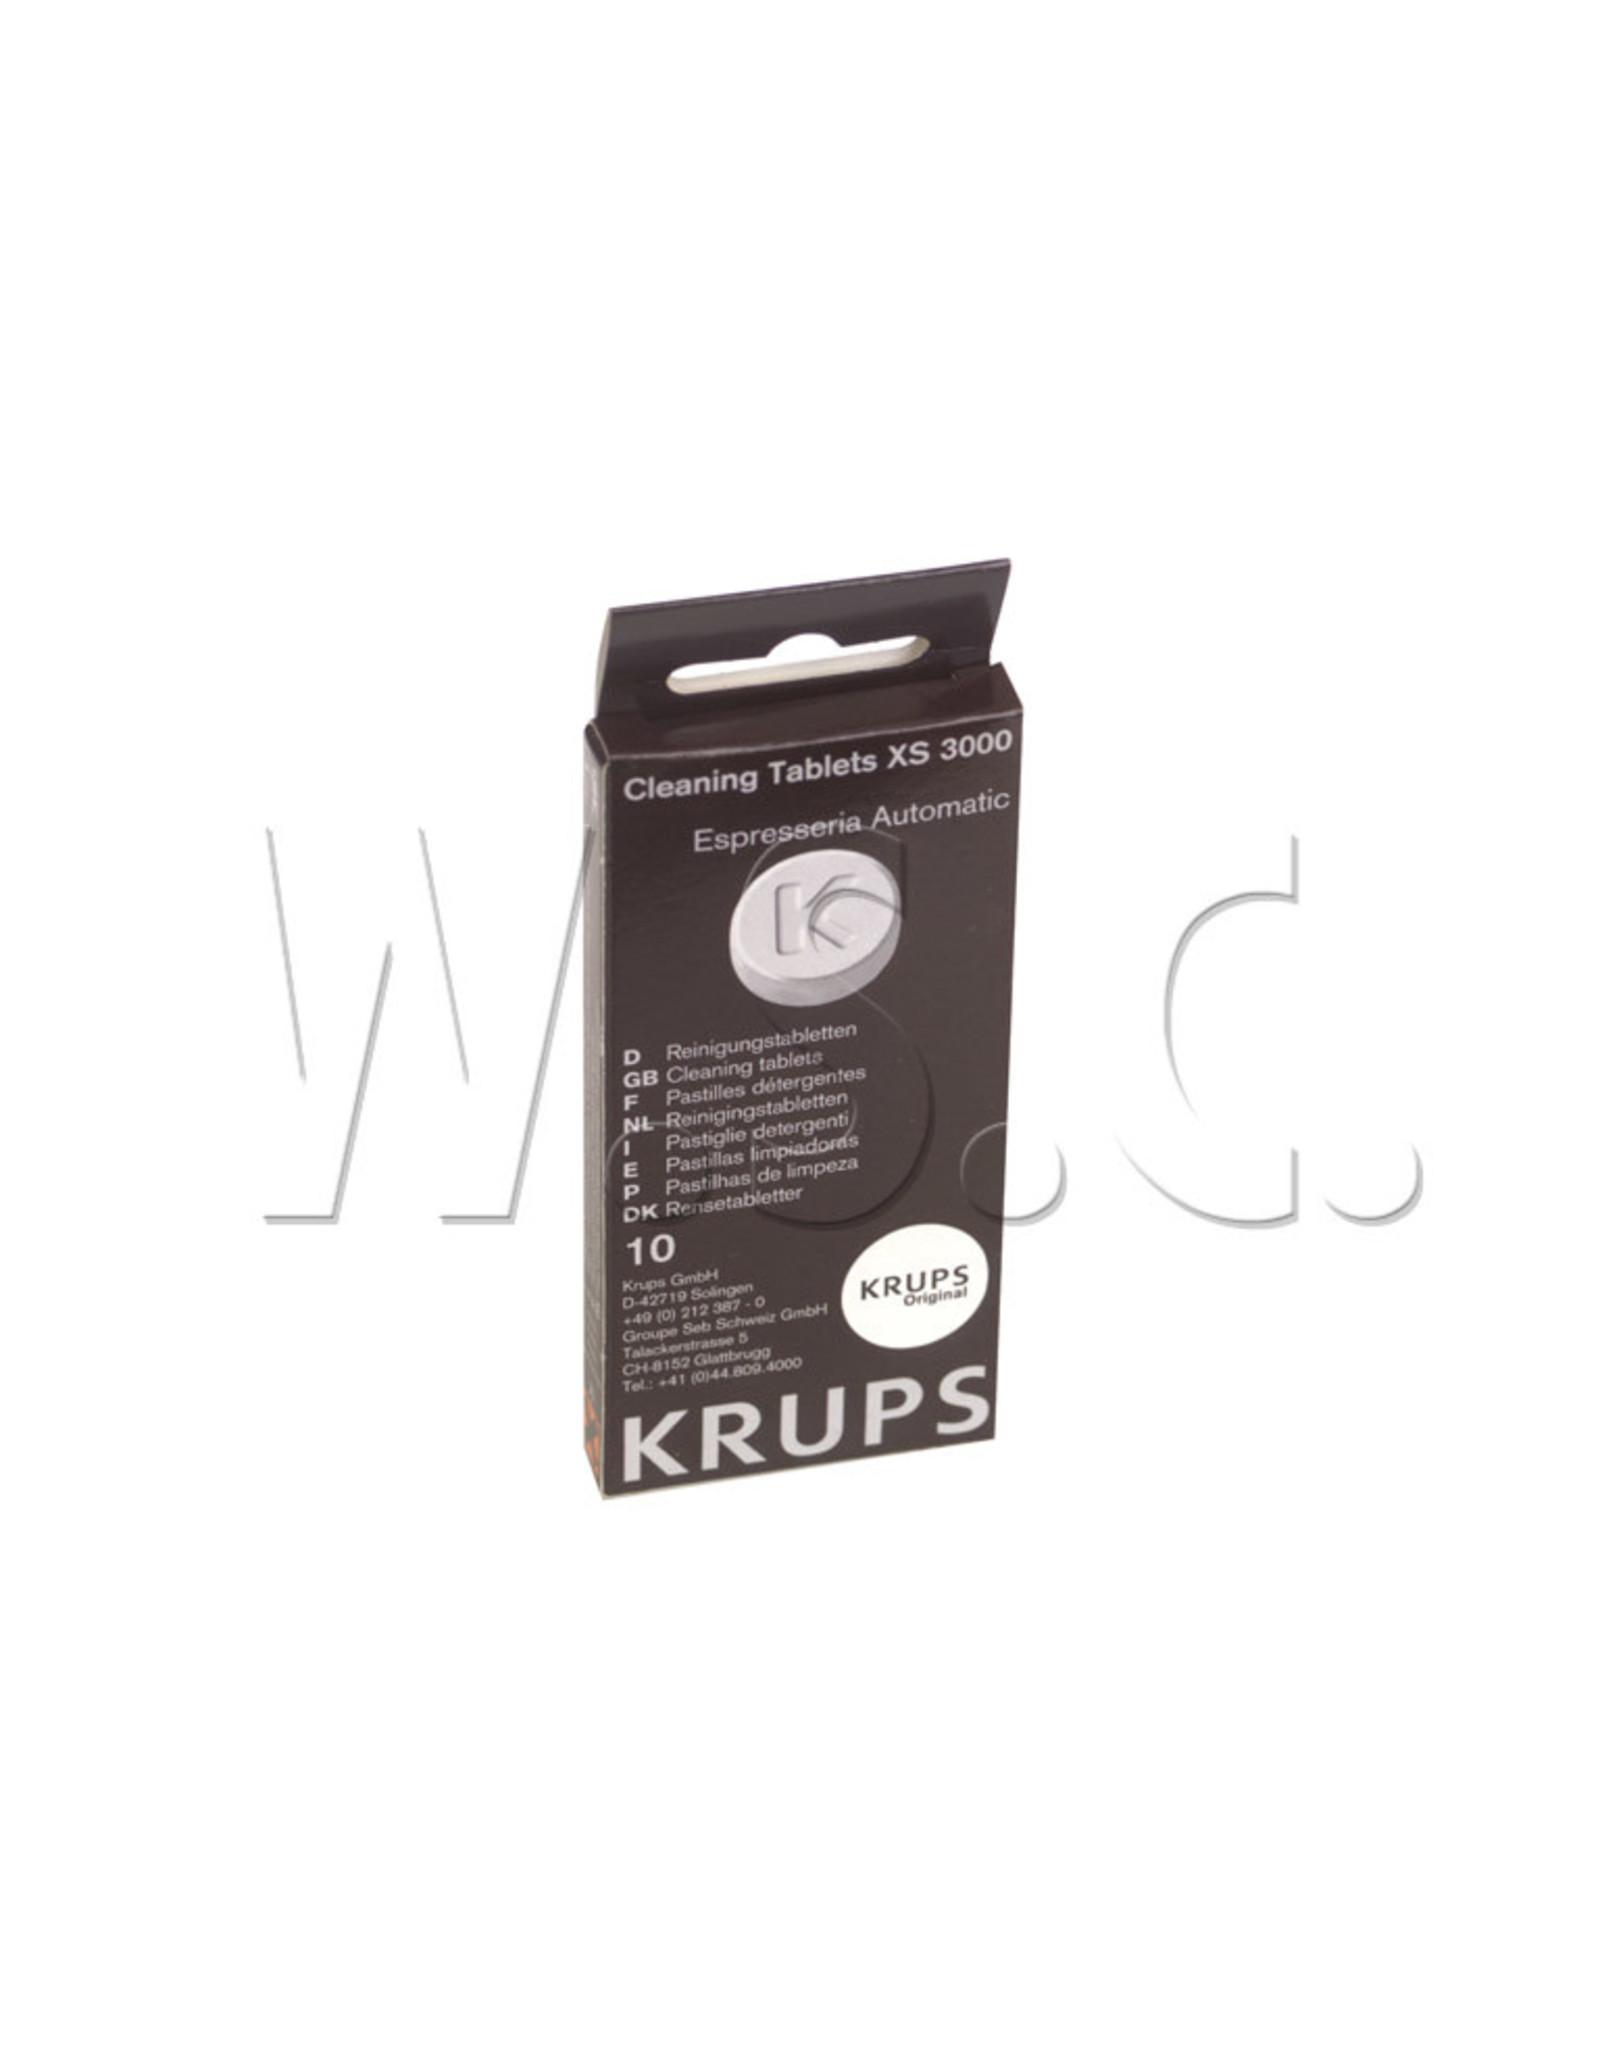 Krups KRUPS ESPRESSO  REINIGINGSTABLETTEN XS3000